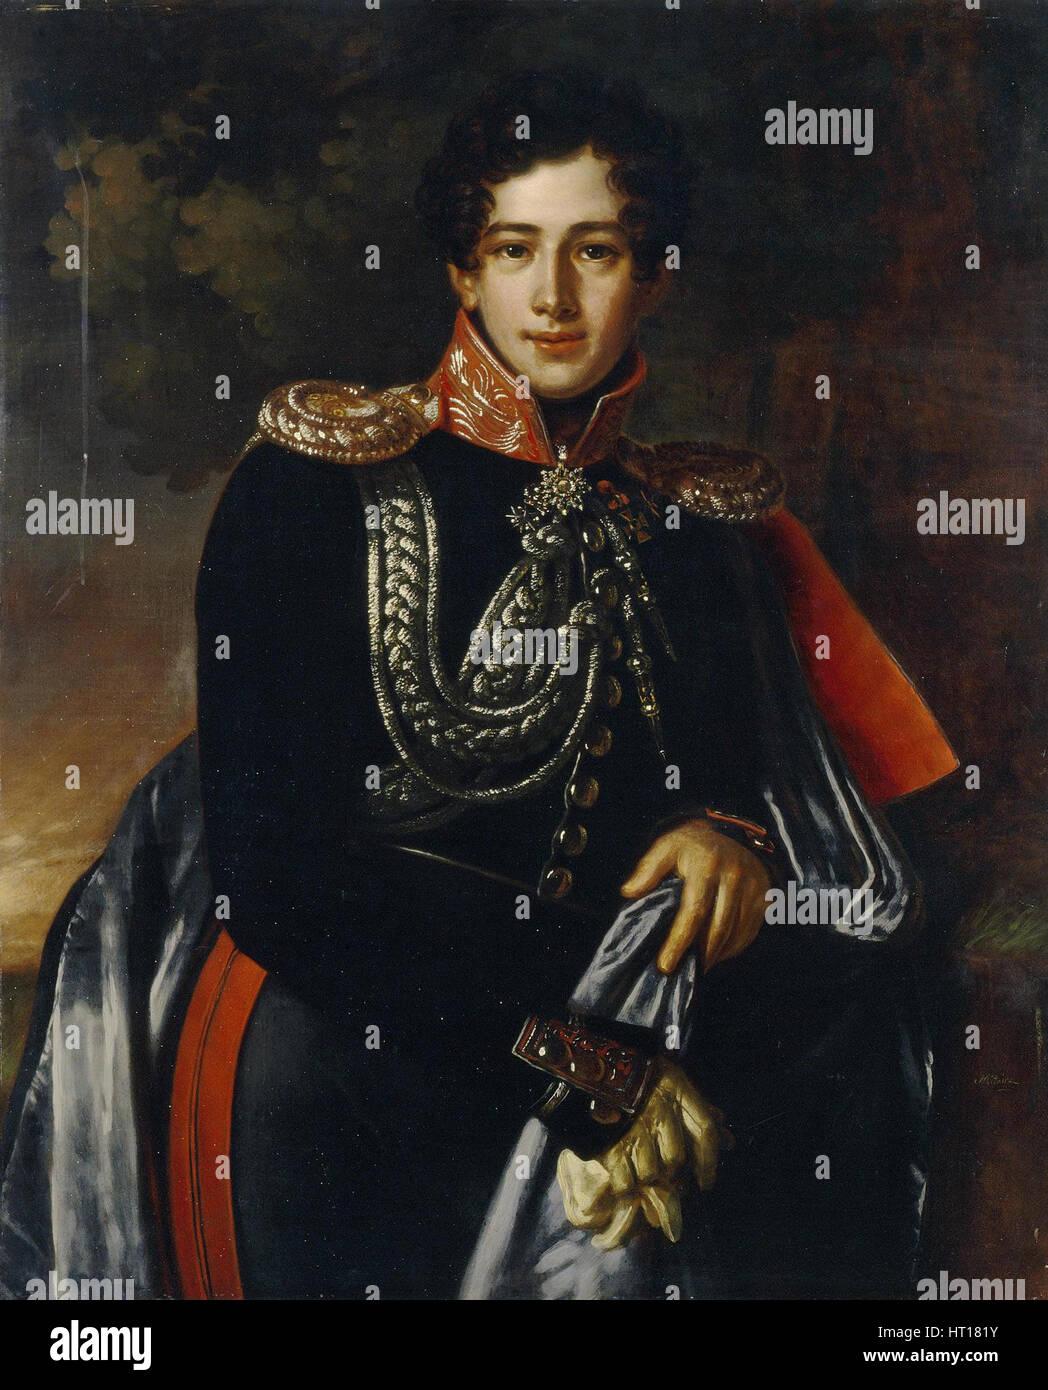 Porträt des Grafen Nikolai Alexandrowitsch Samoylov (1800-1842), ca. 1825. Künstler: Mitoire, Benois Karl Stockbild